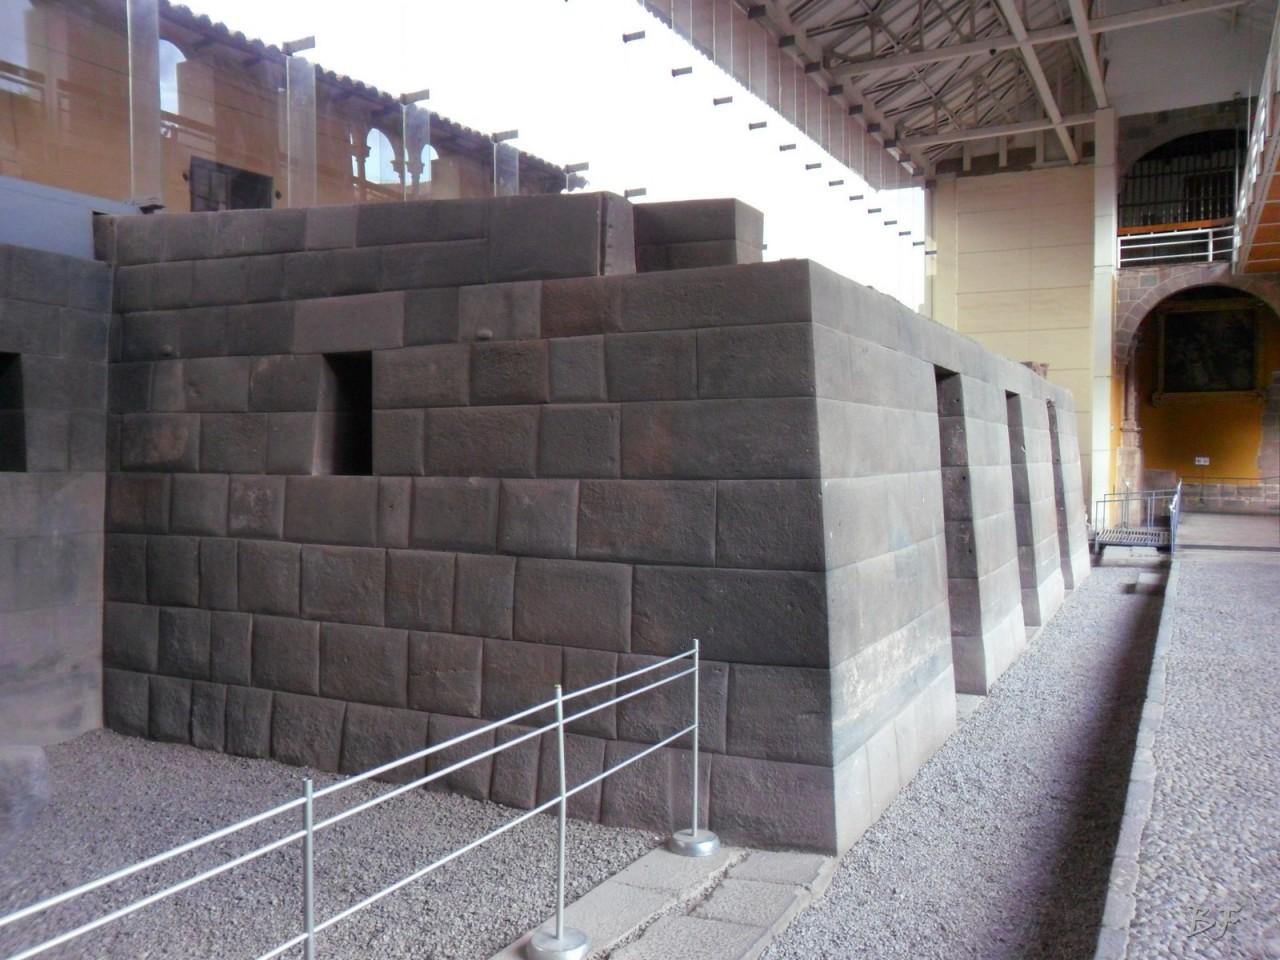 Mura-Poligonali-Megaliti-Tempio-Coricancha-Cusco-Perù-24